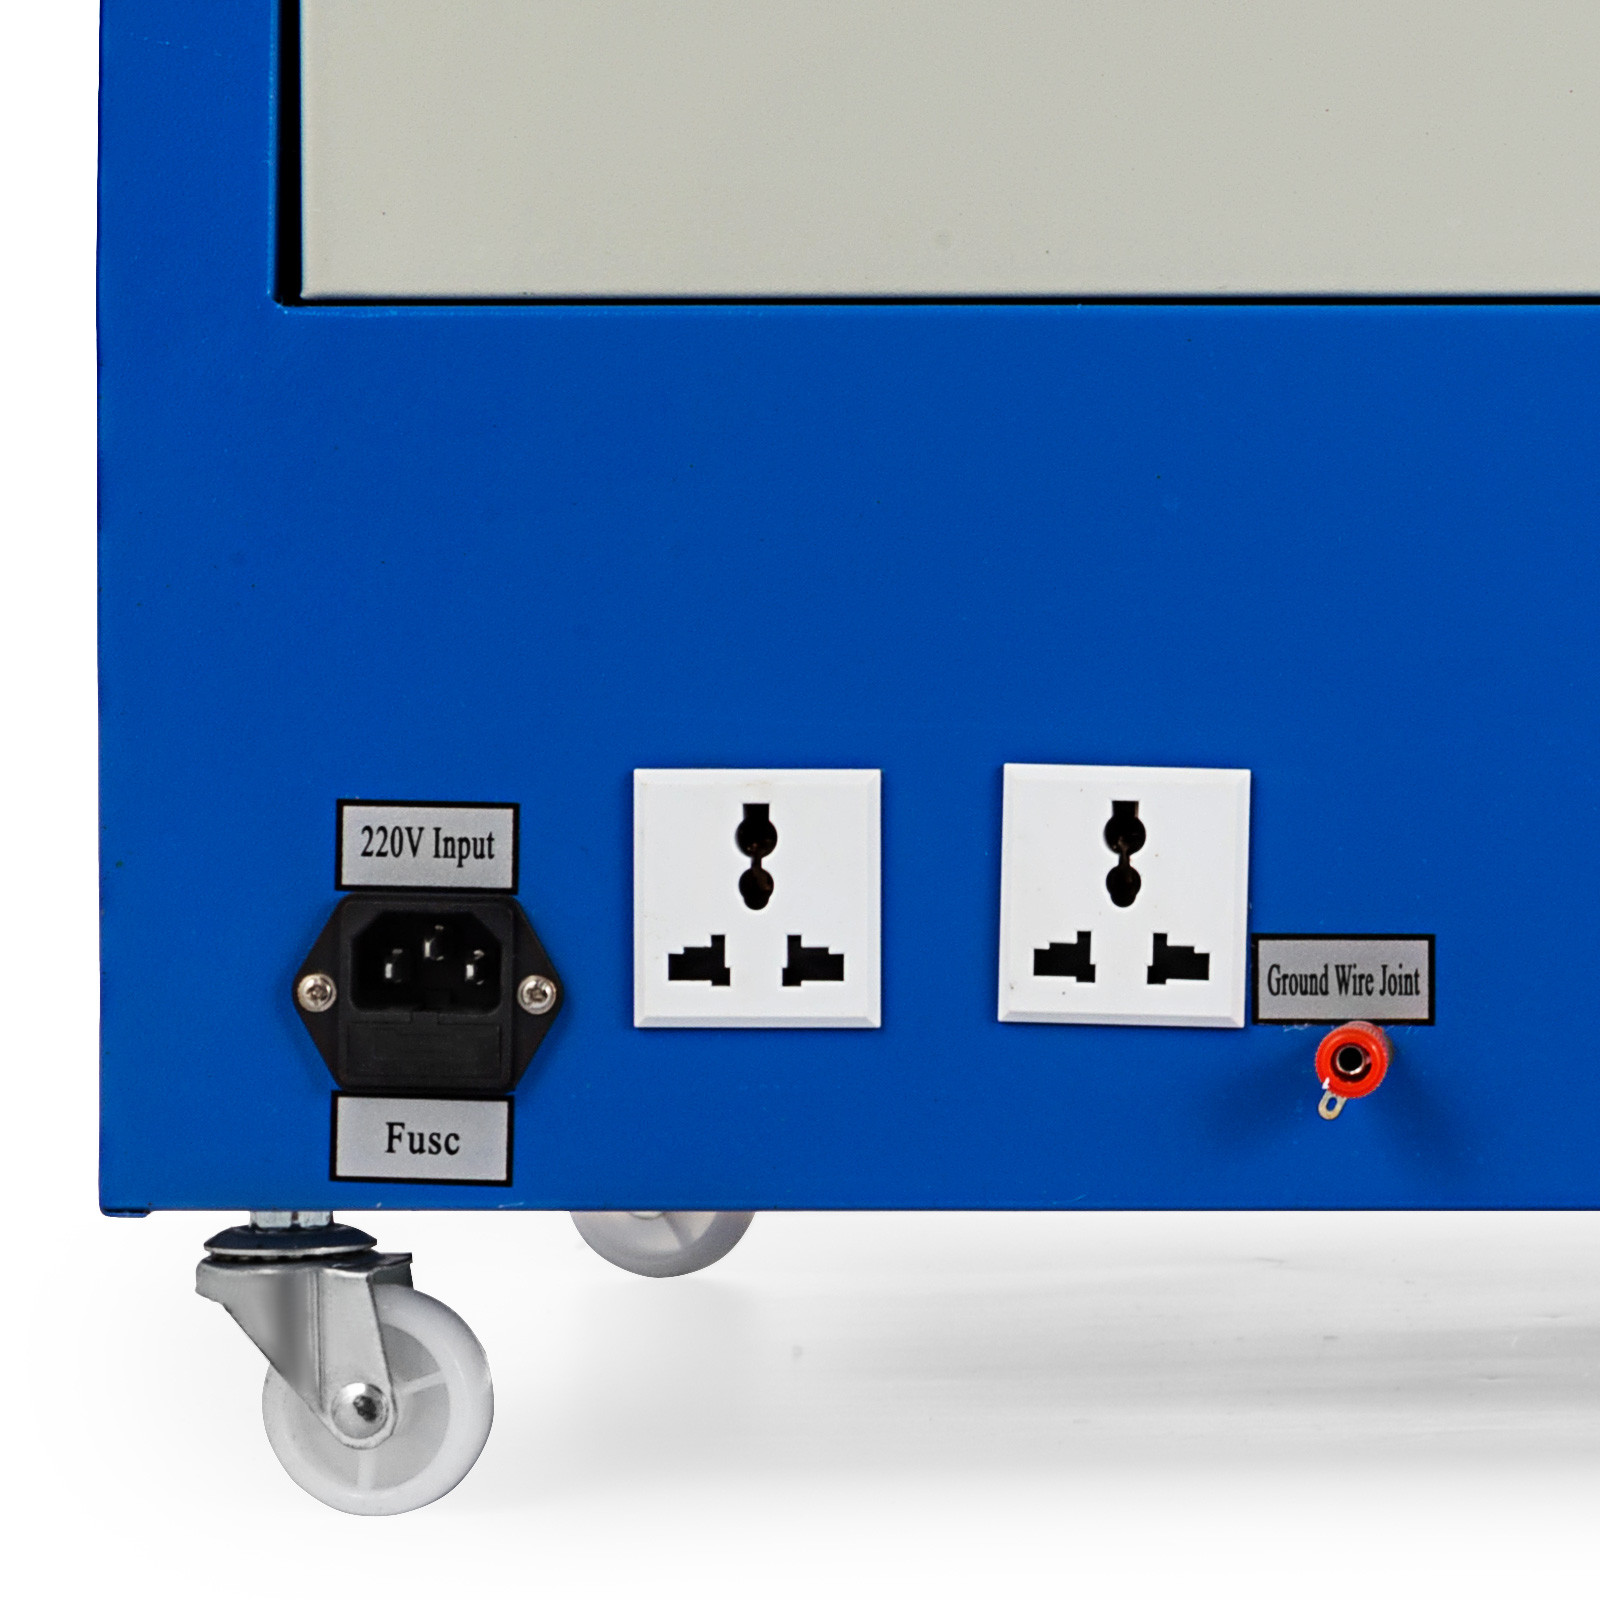 Macchina-per-Incisione-Laser-CO2-40-130W-Asse-Rotante-Tagliatrice-Incisore miniatura 105